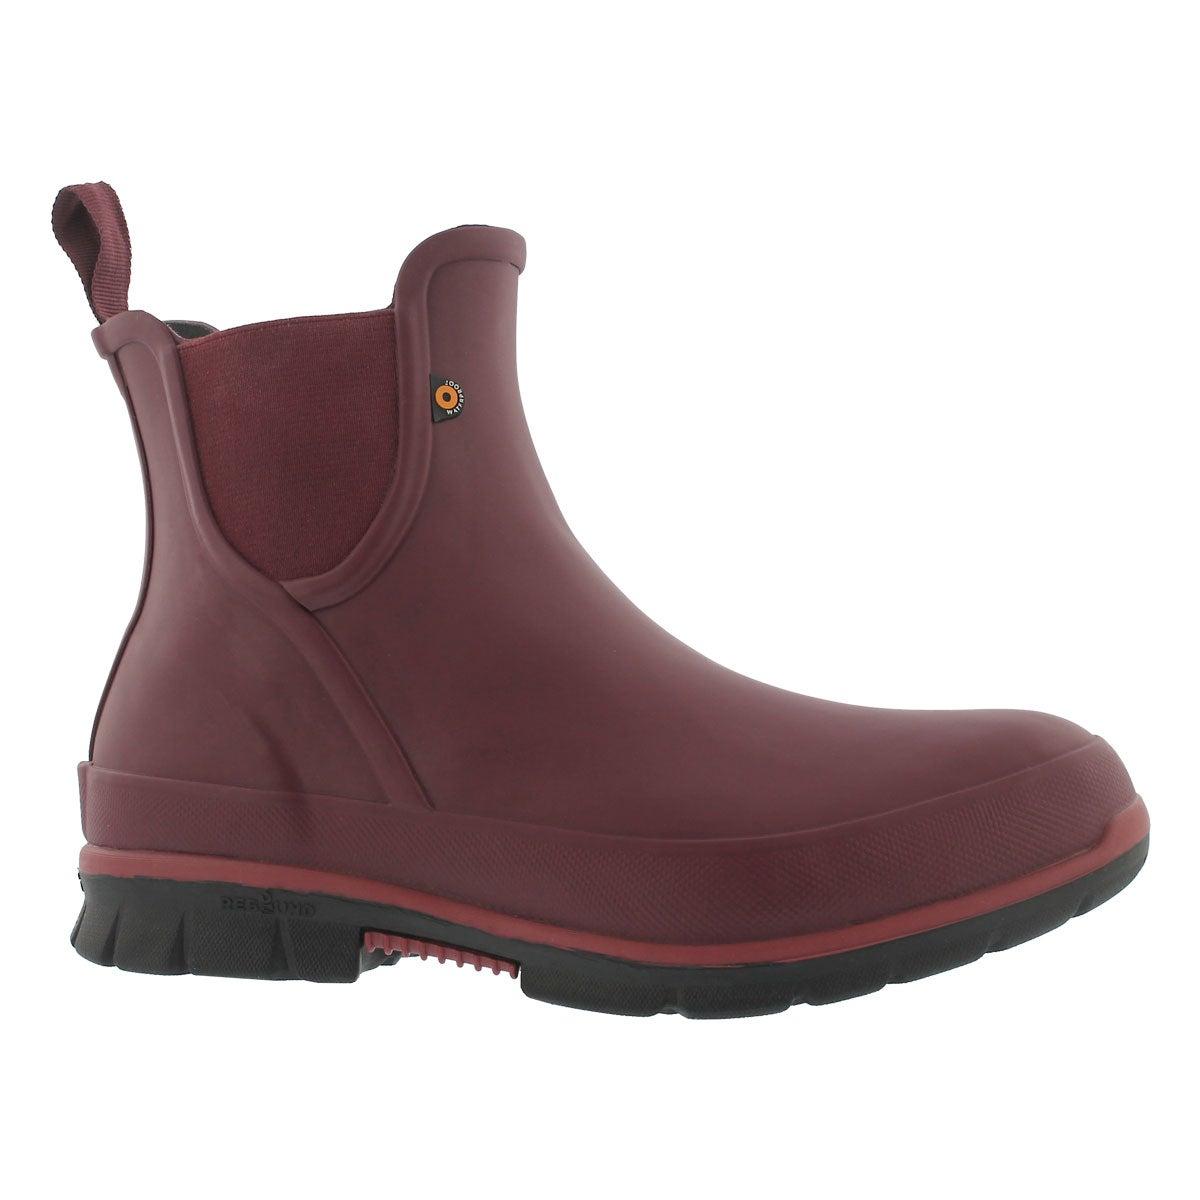 Women's AMANDA burgundy wateproof low rain boots